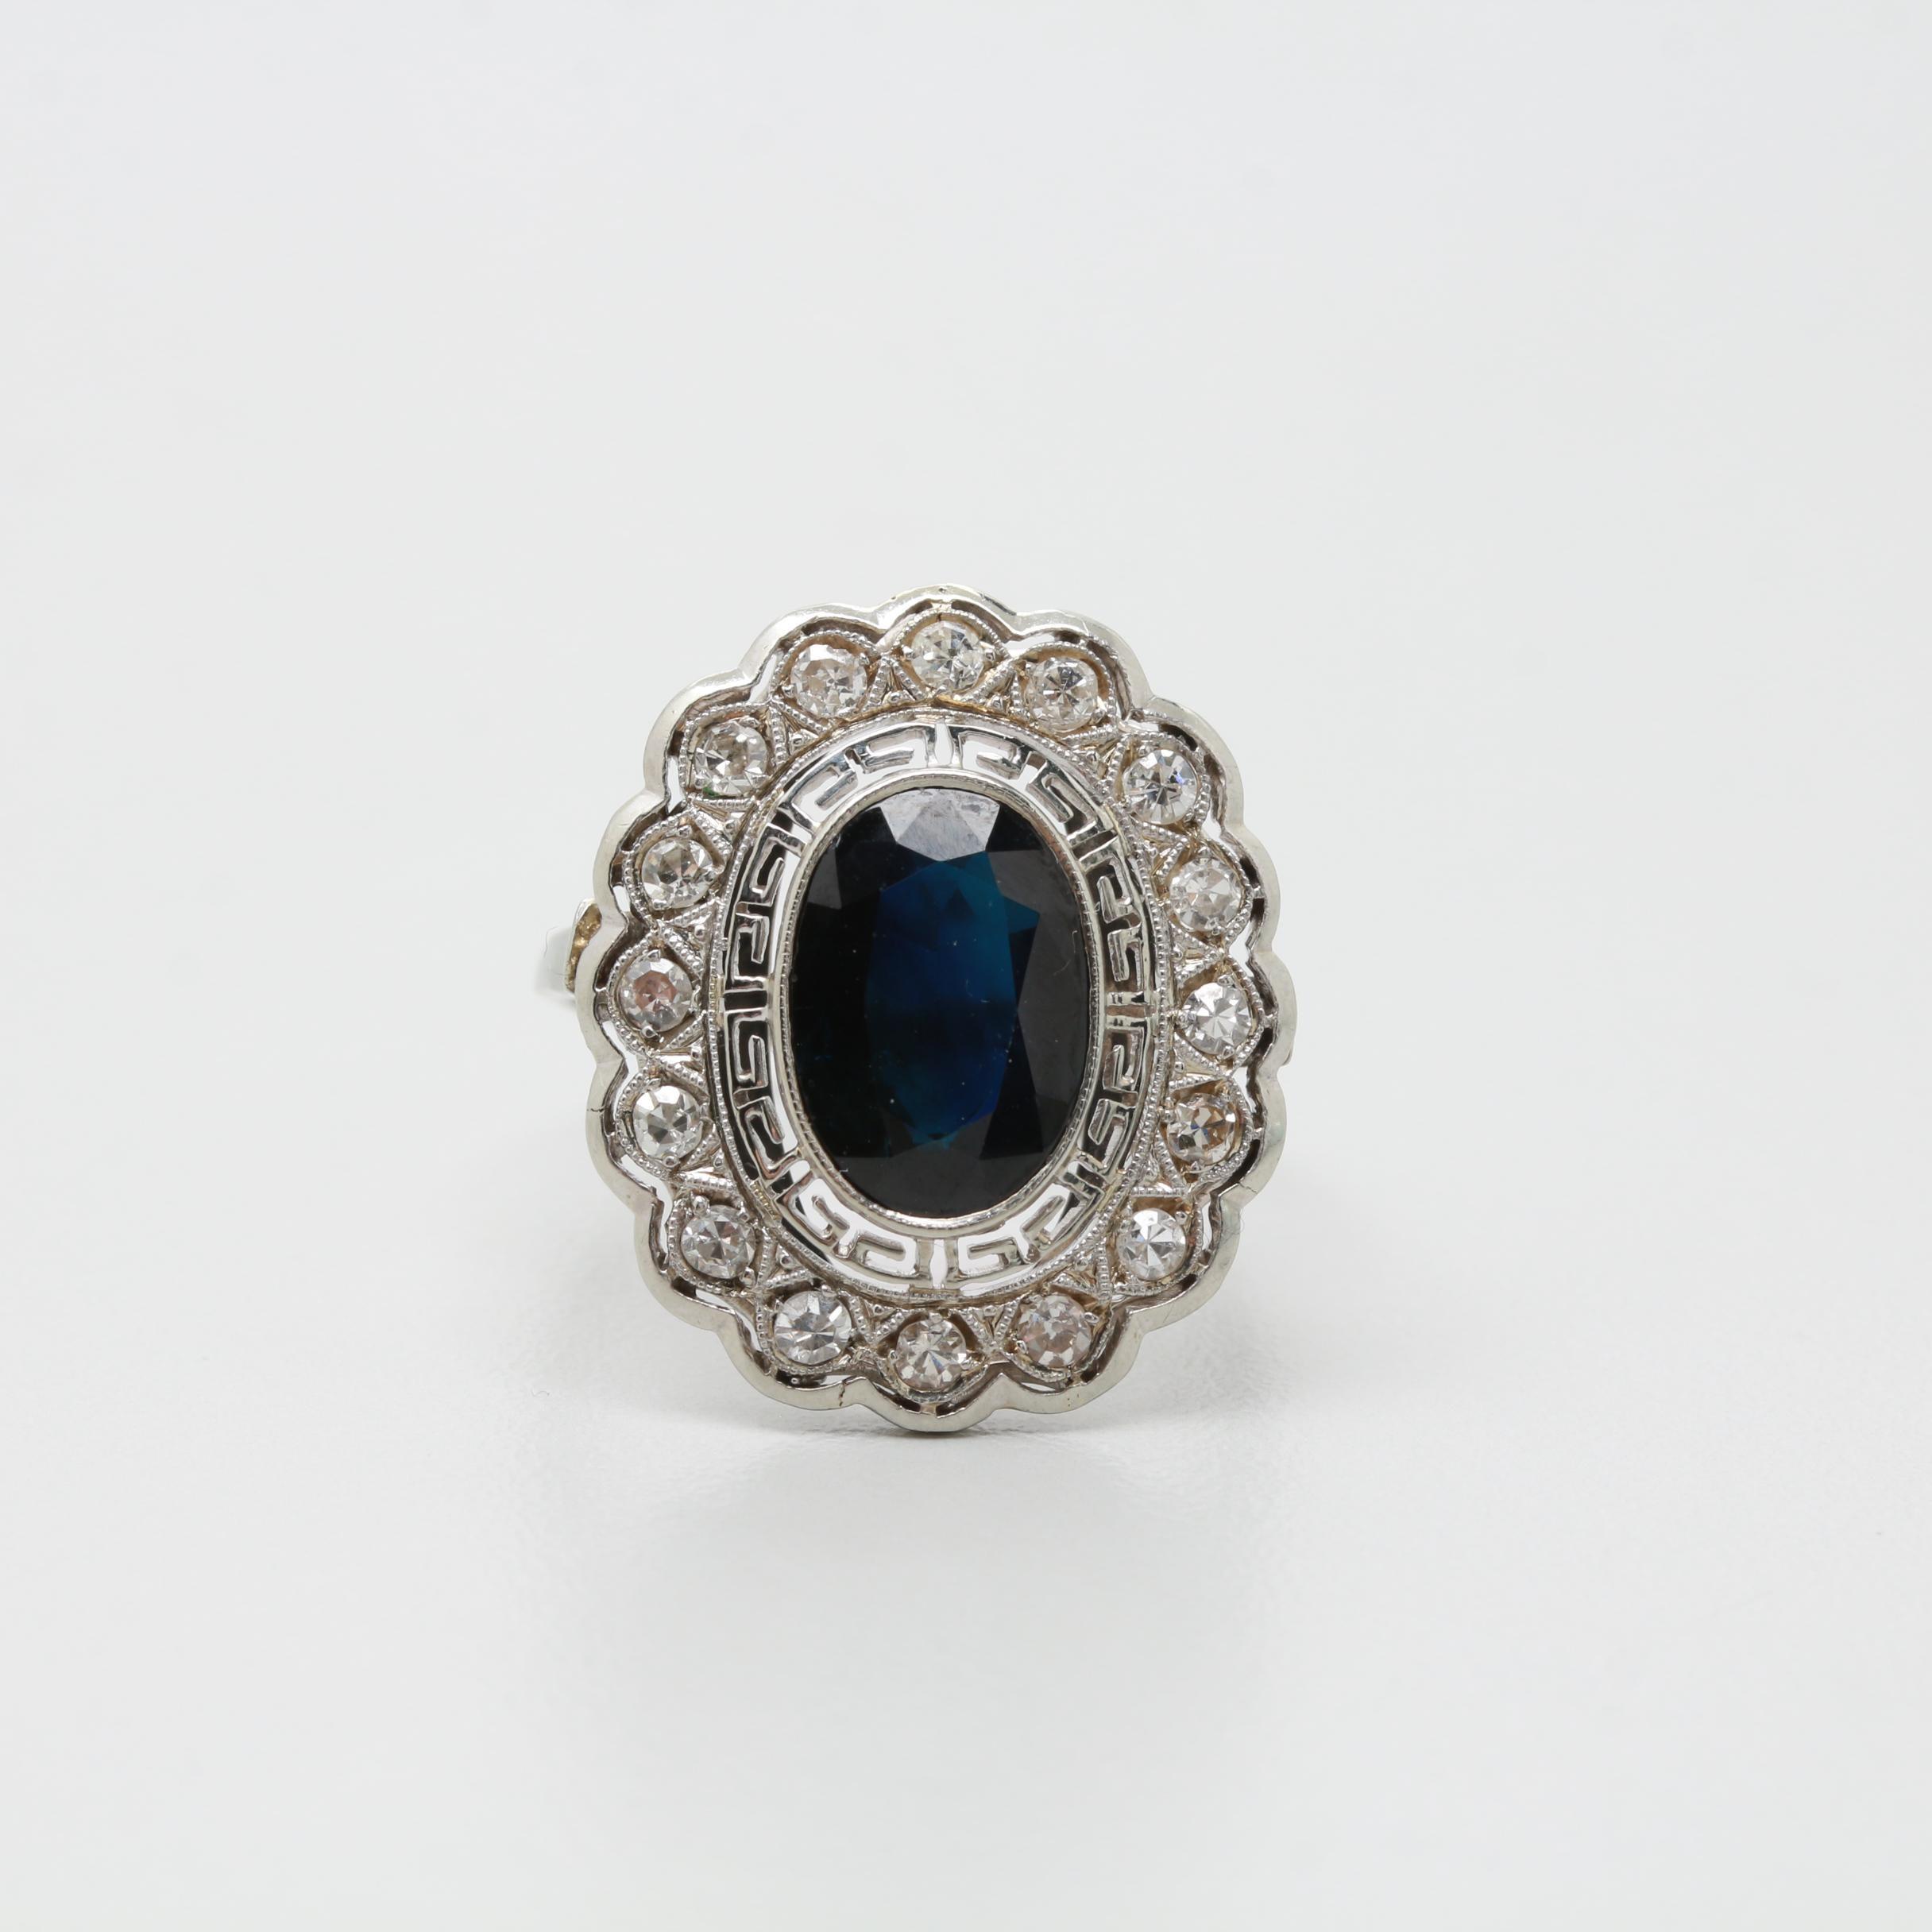 18K White Gold 2.91 CT Sapphire and Diamond Ring